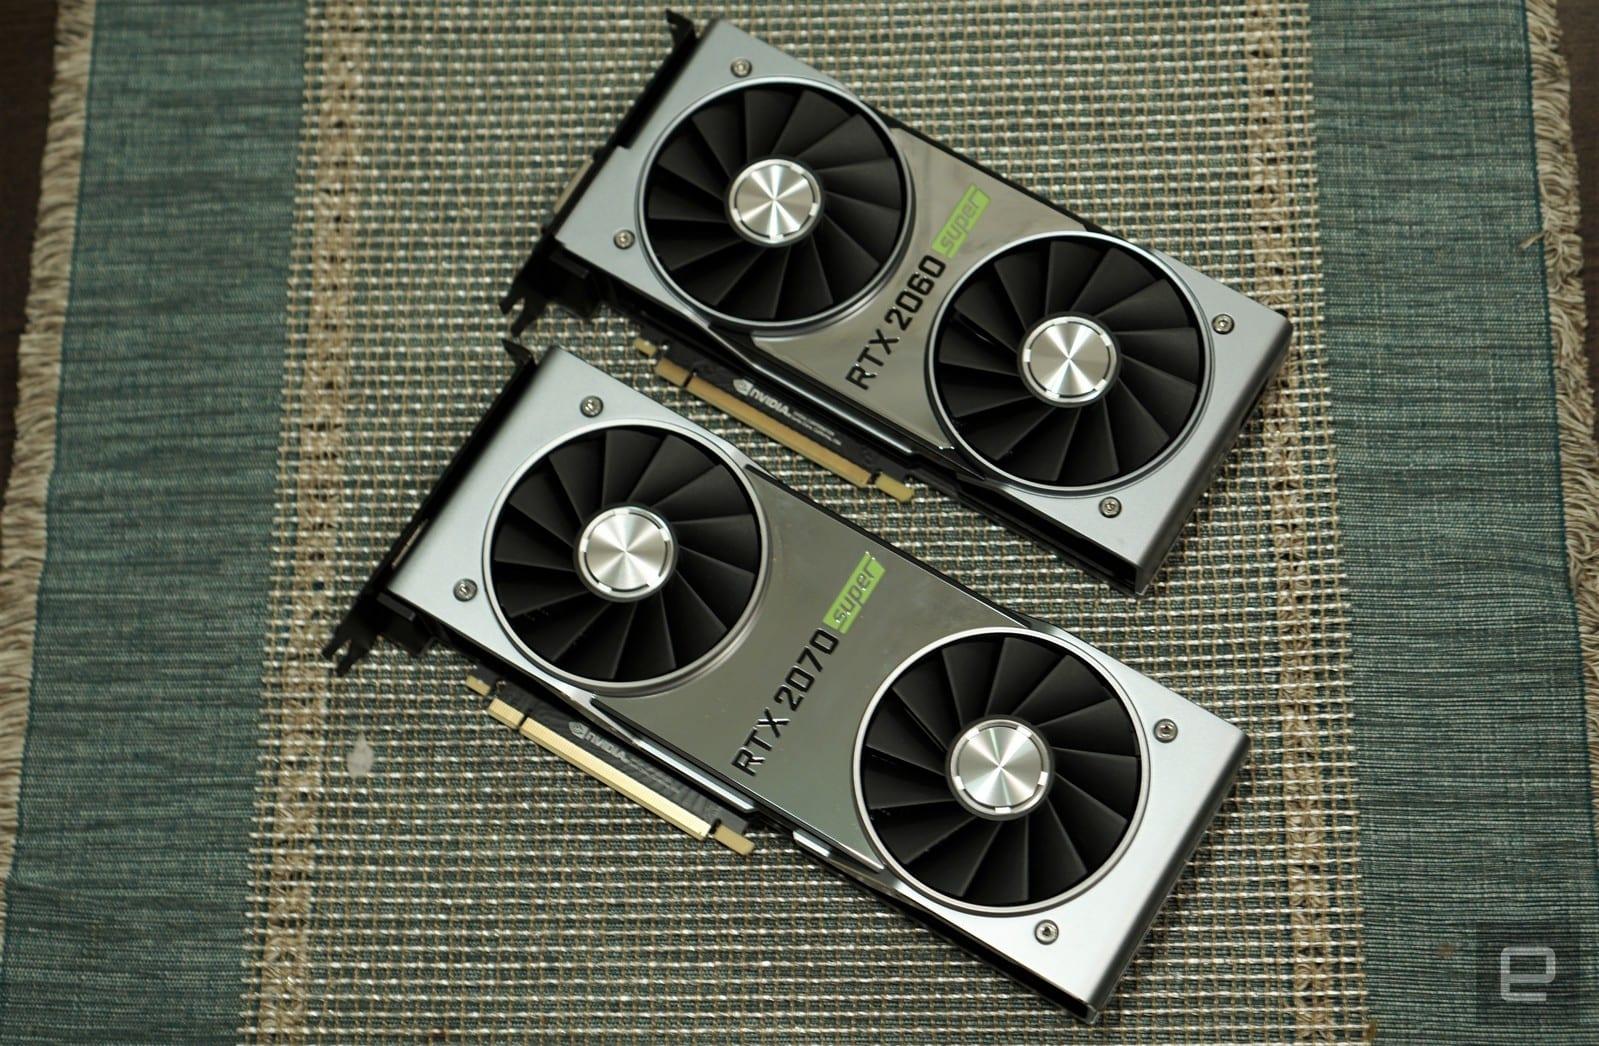 NVIDIA RTX 2060 Super and 2070 Super